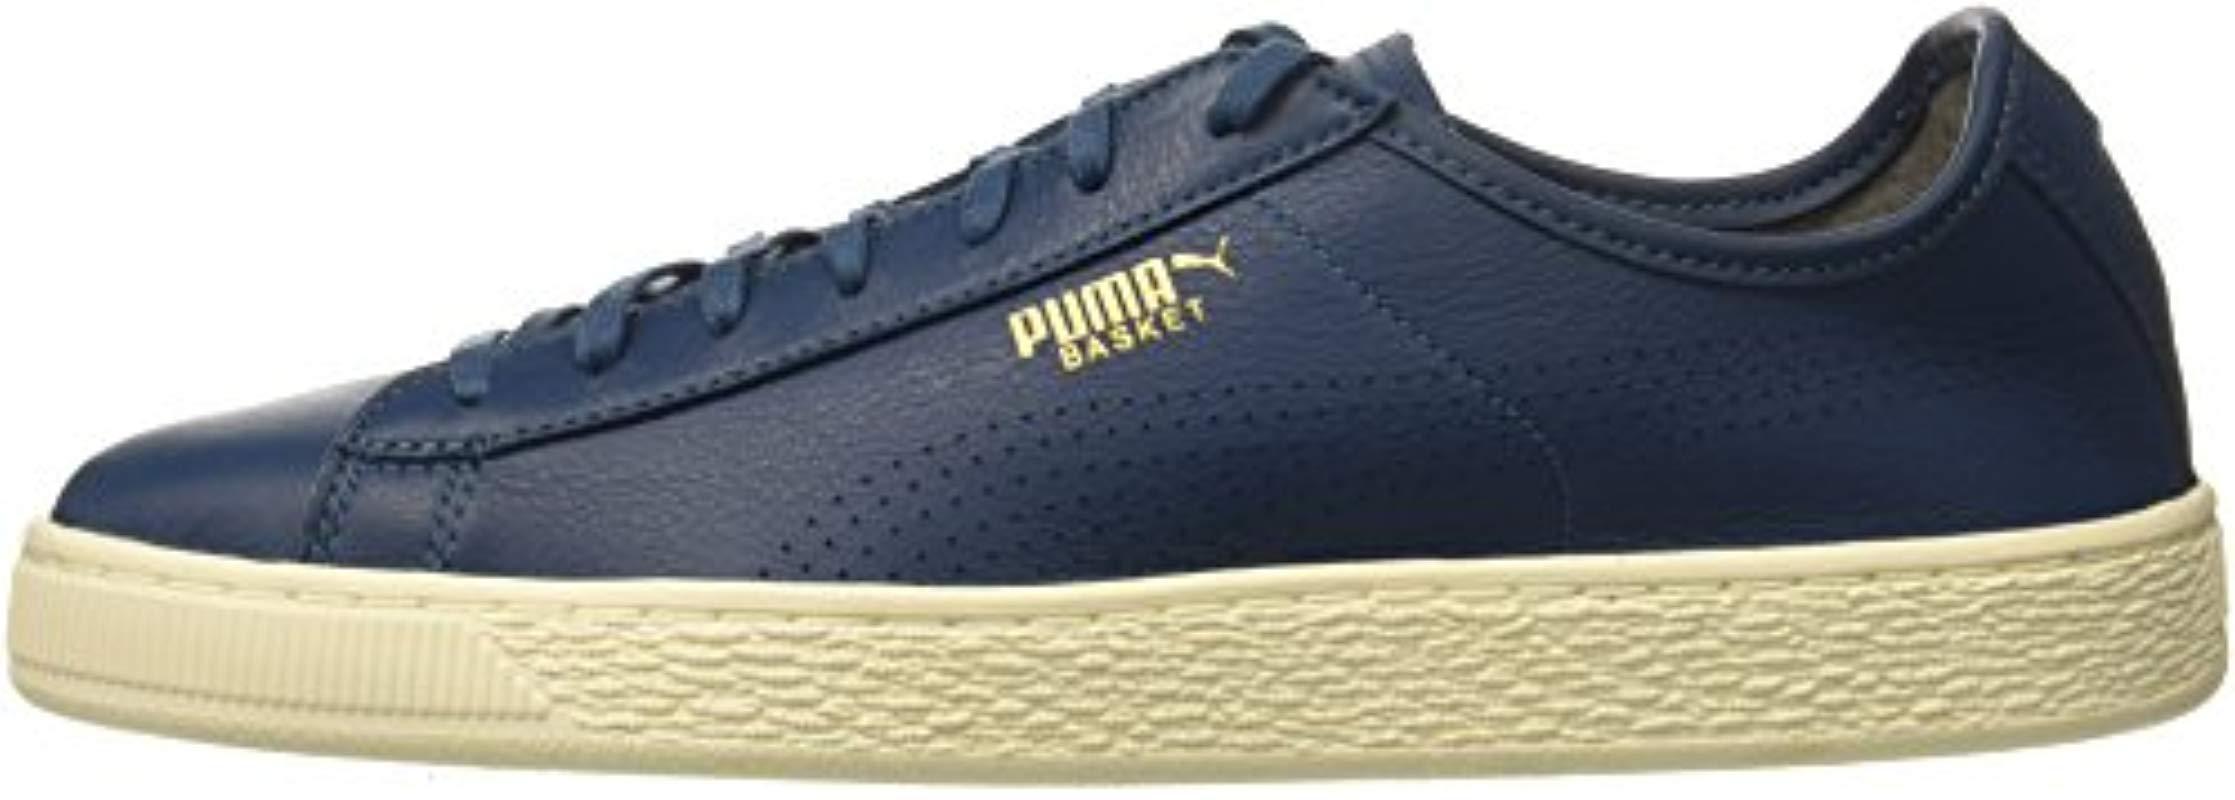 puma basket classic soft